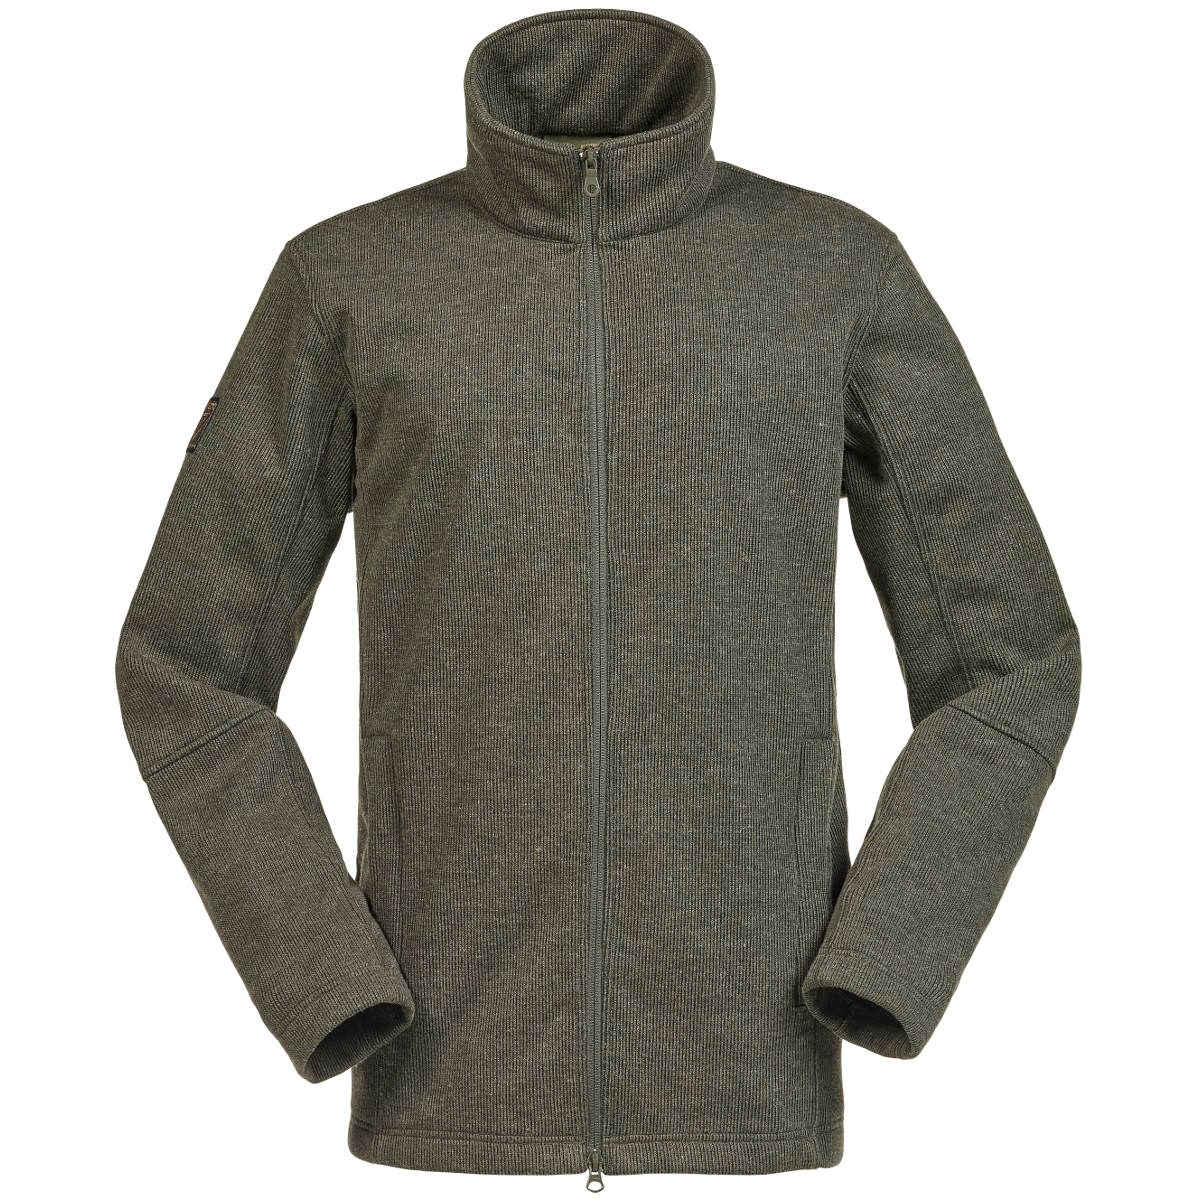 c082b132a0c687 Musto Tech Wool Mens Fleece Jacket - Forest Green - Redpost Equestrian